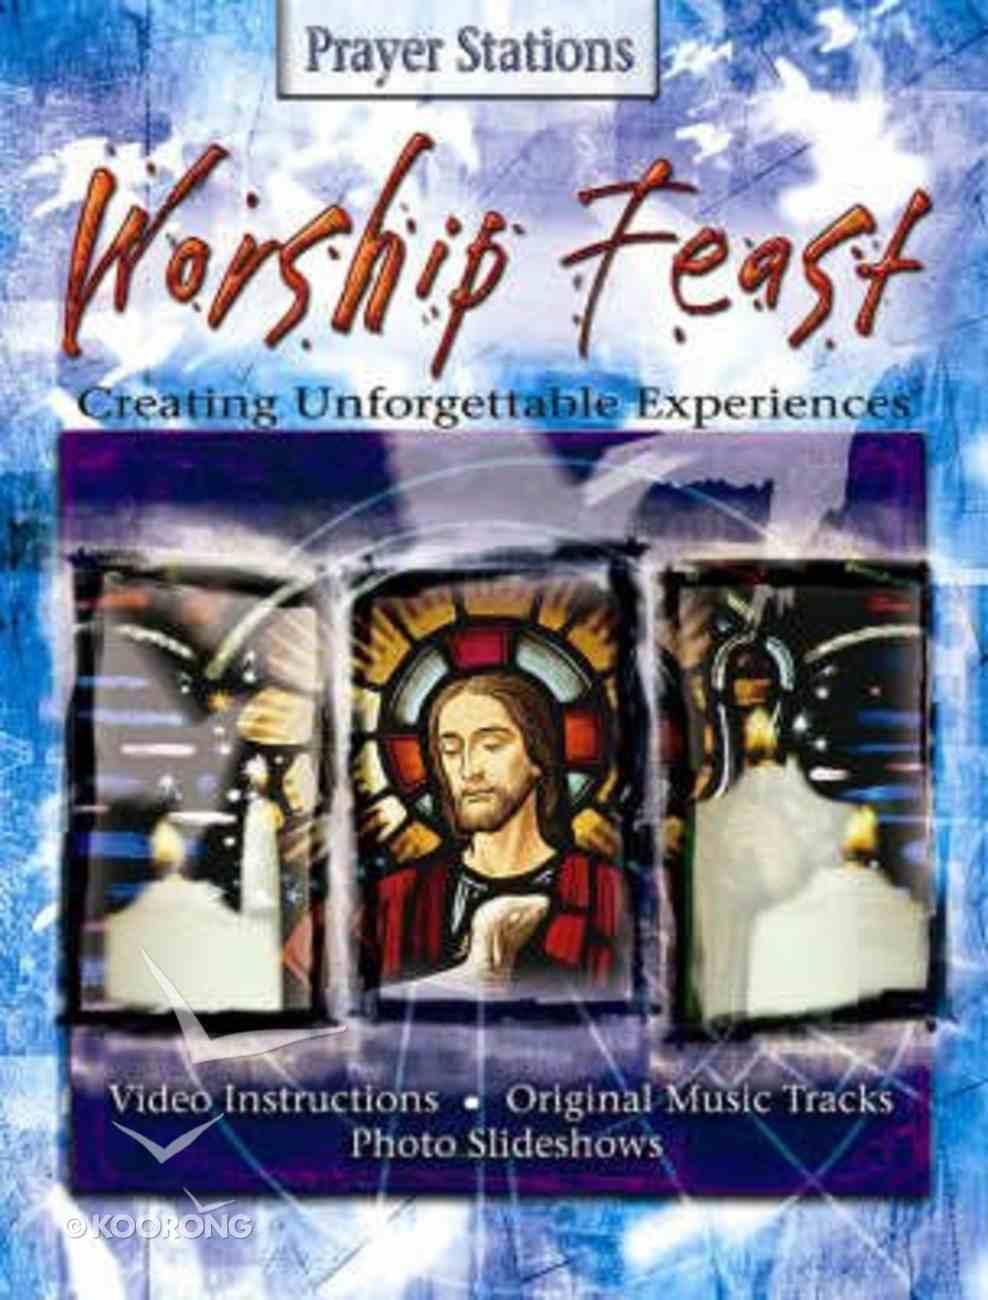 Worship Feast: Prayer Stations (Cd) CD